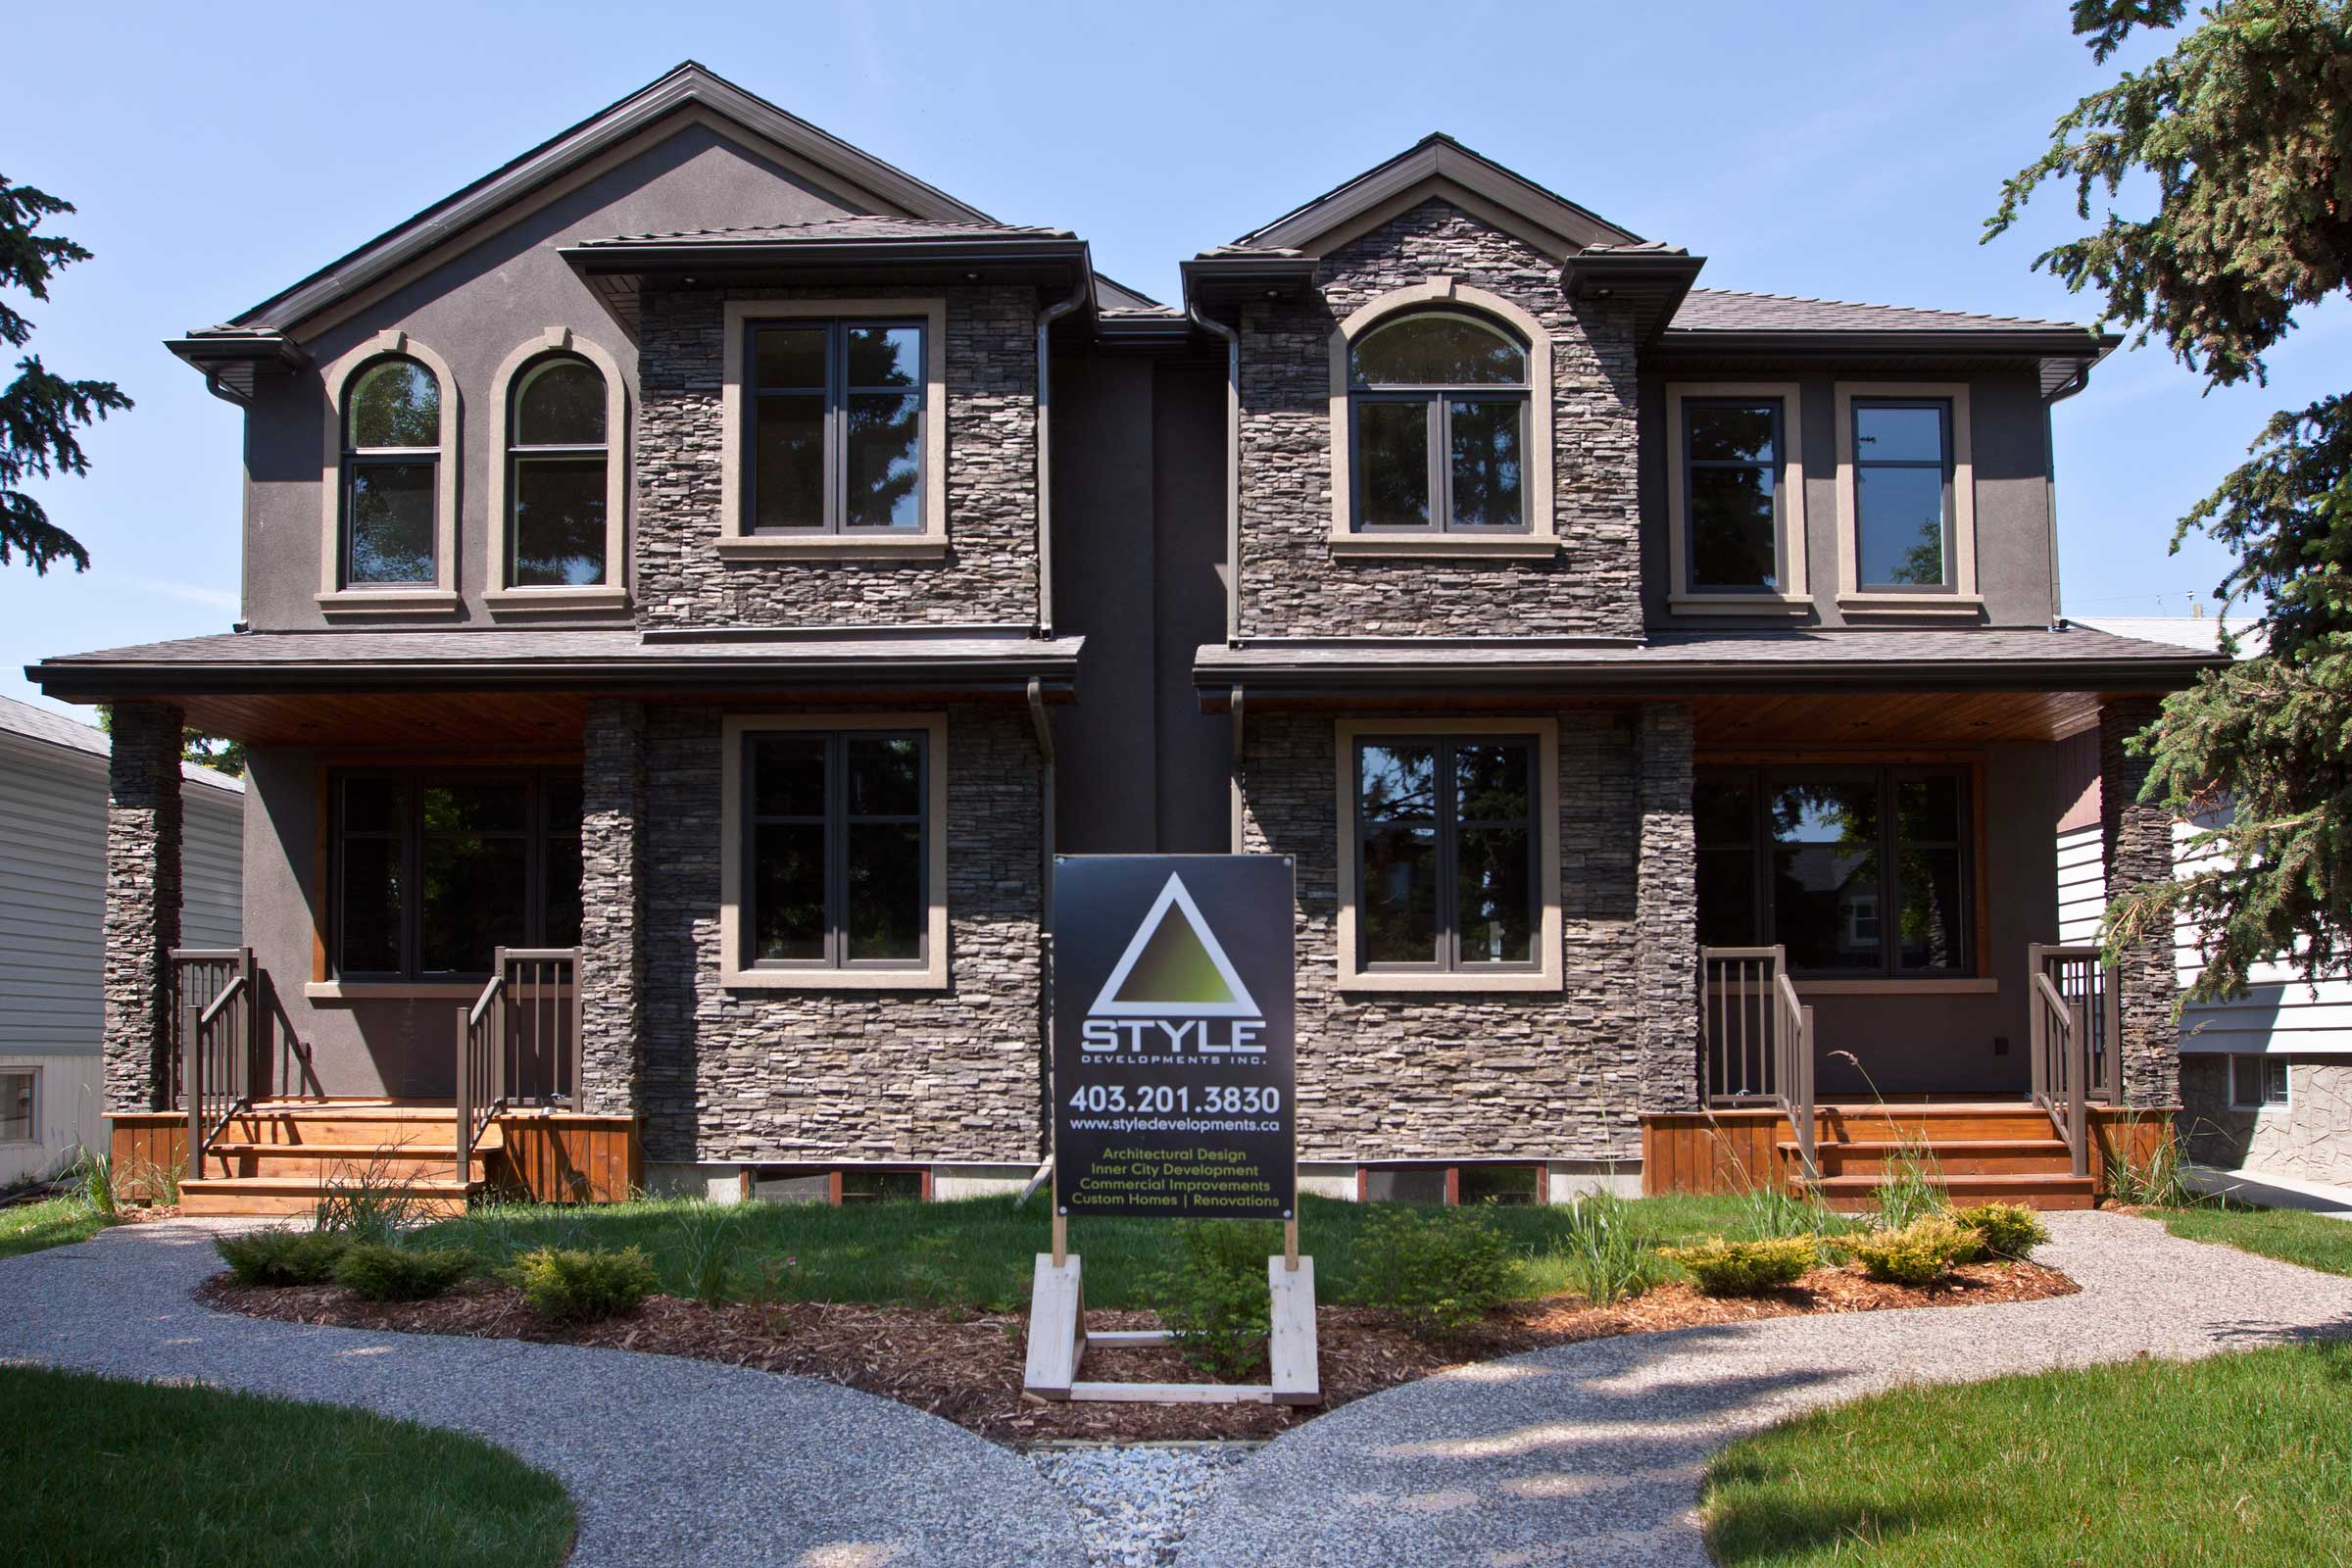 Duplex remodel by Style Developments in Calgary Alberta